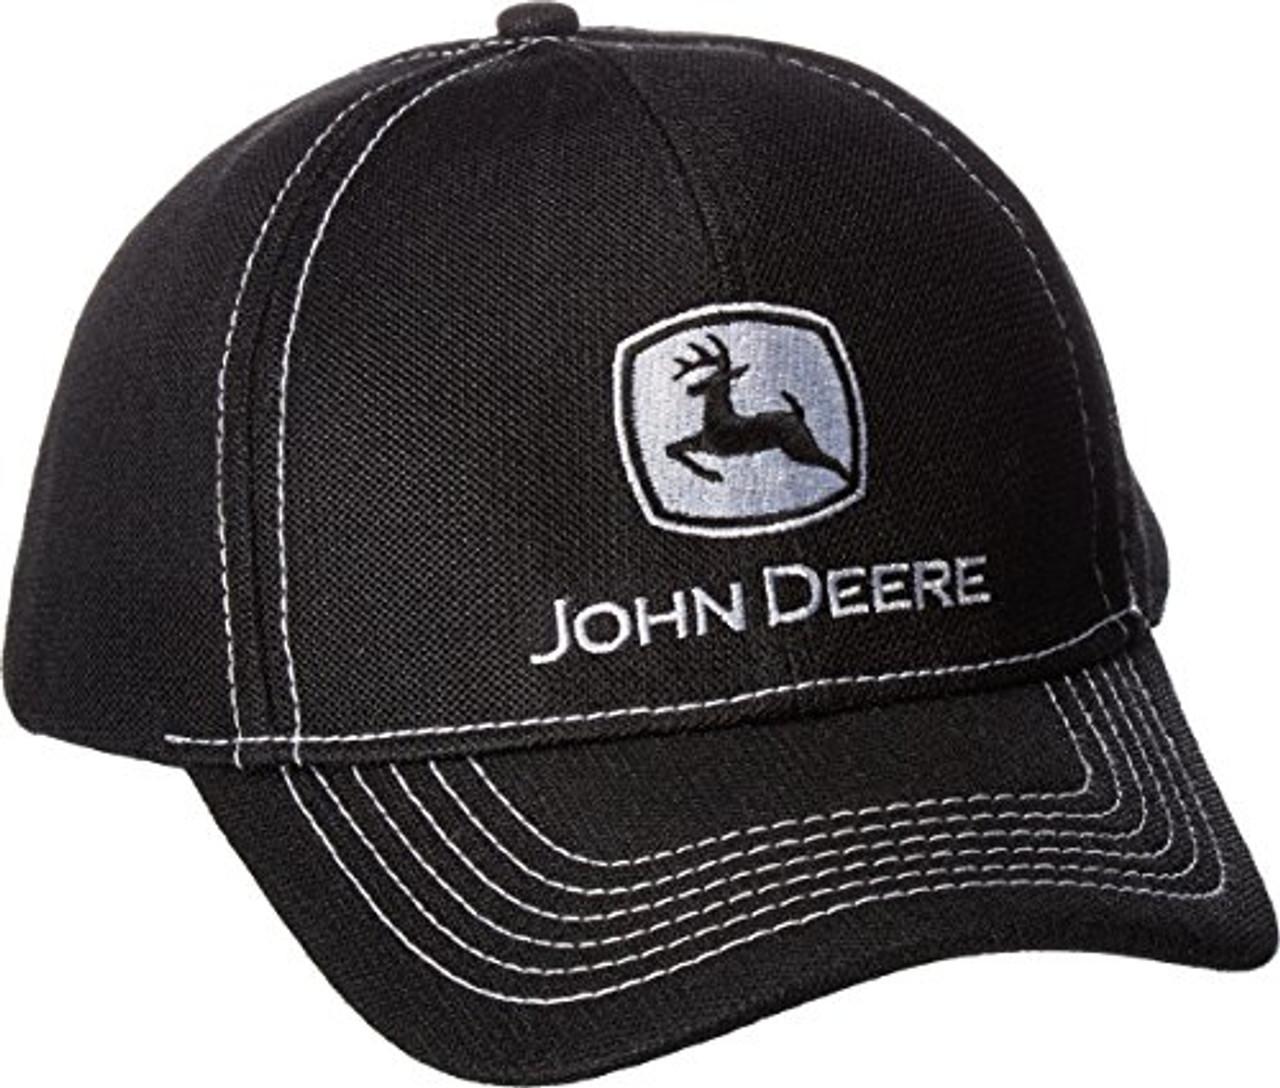 e06098e93cf John Deere Diamond Poly Mesh Black Contrast Stitch Hat - Trenz Shirt Company